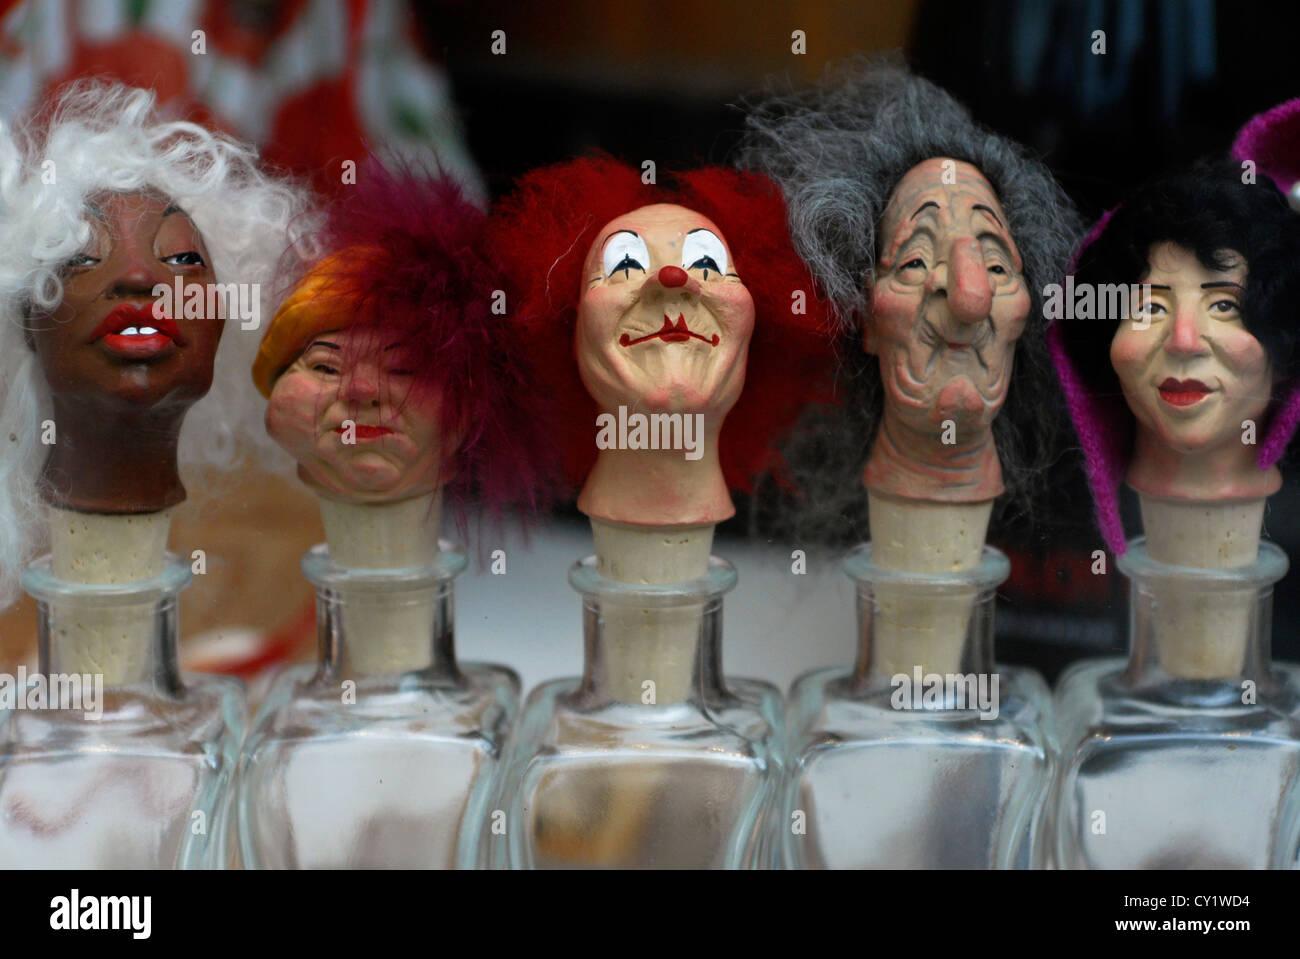 Philharmoniker Gasse Genuss Fass Souvenirs, wines Salzburg, Shop, Austria, Europe - Stock Image